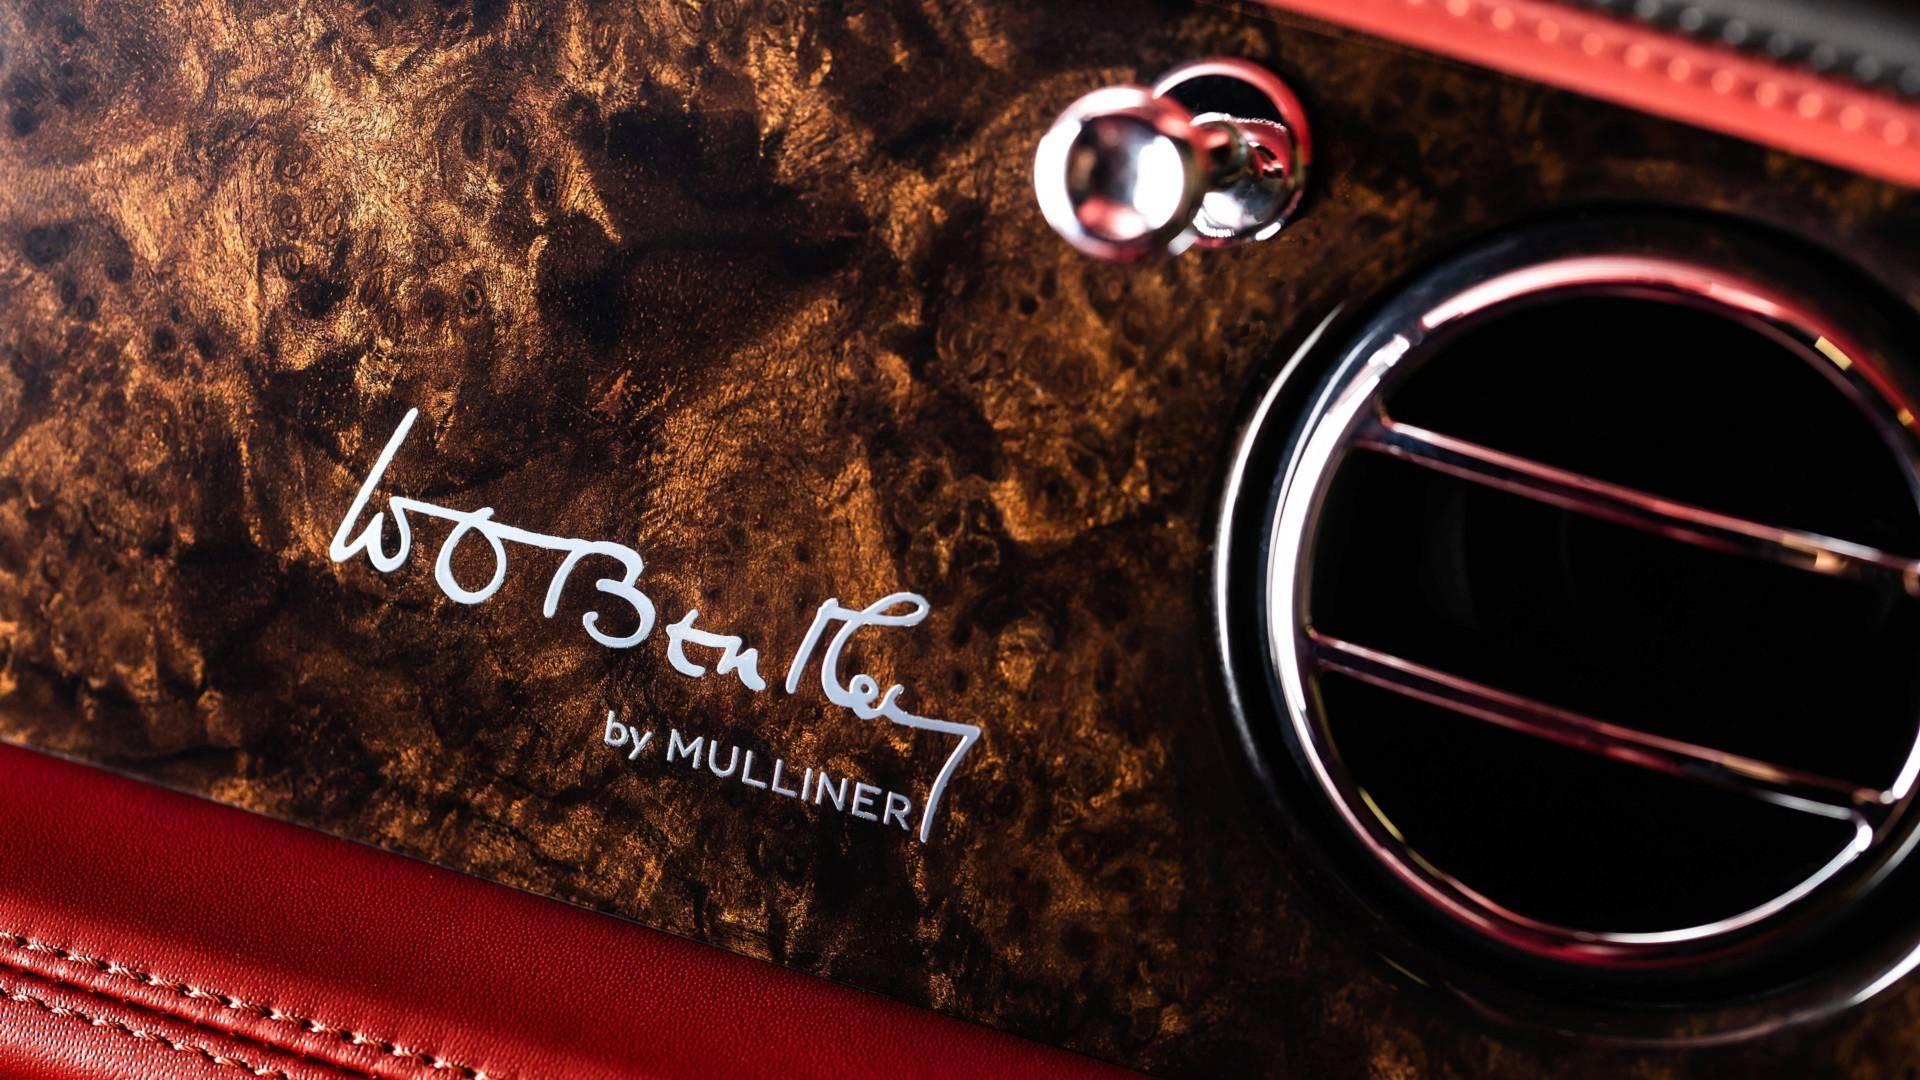 bentley-mulsanne-wo-edition-by-mulliner-inside6